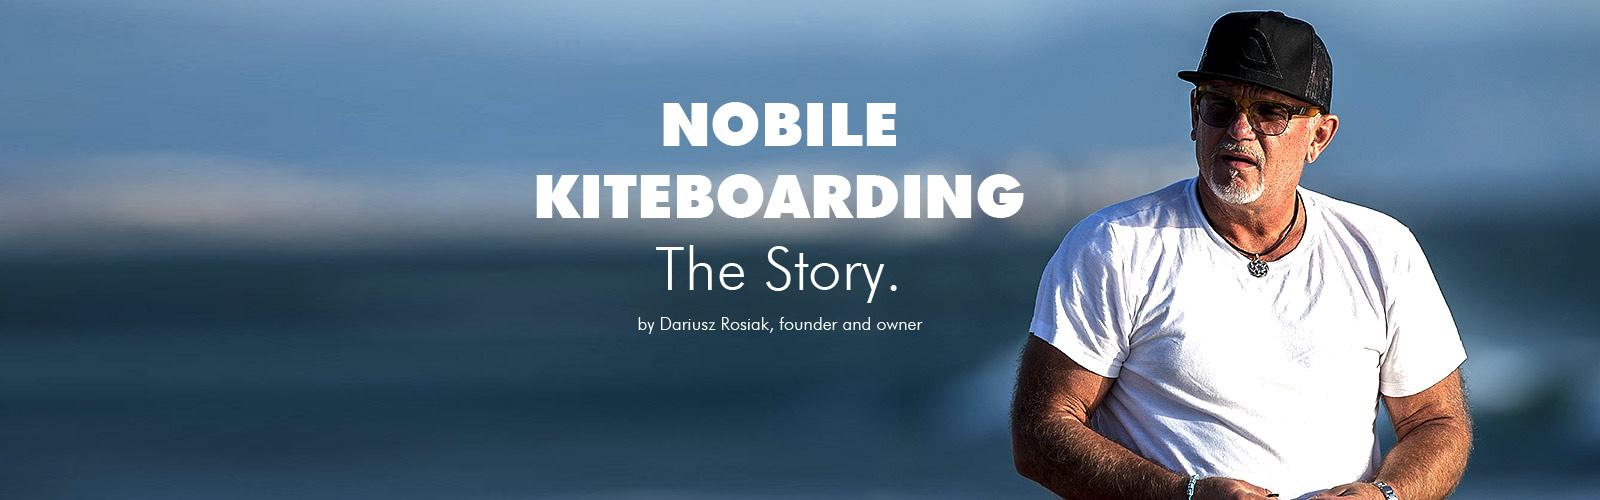 Nobile.The Story by Dariusz Rosiak